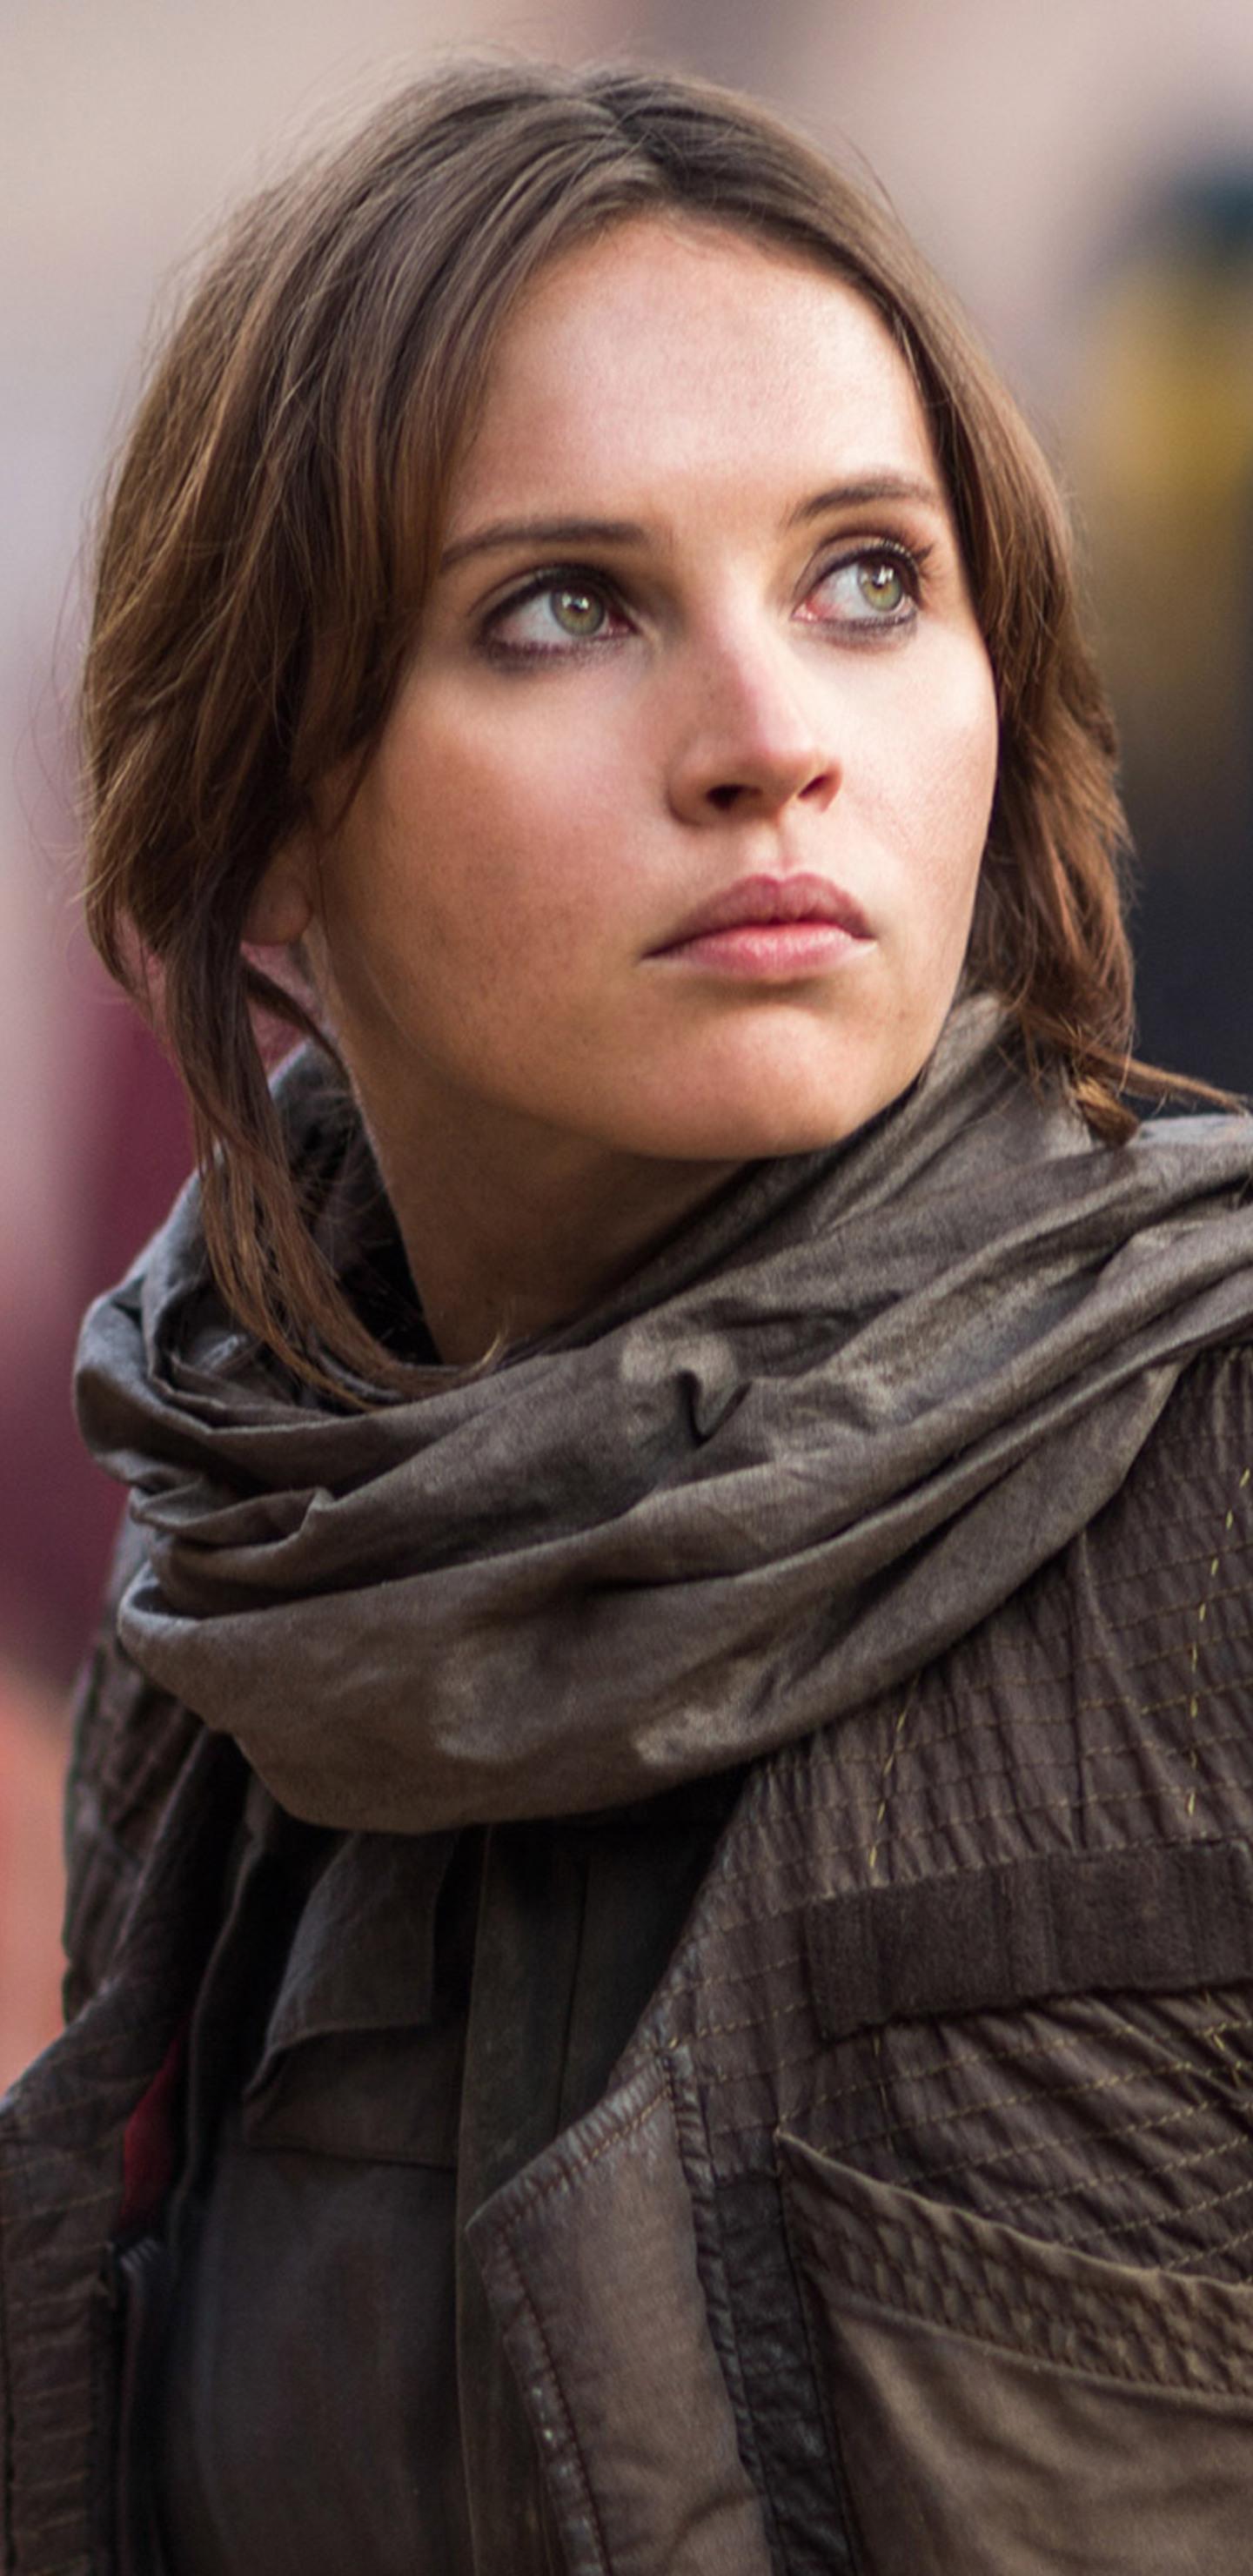 1440x2960 Felicity Jones As Jyn Erso In Rogue One Star Wars Samsung